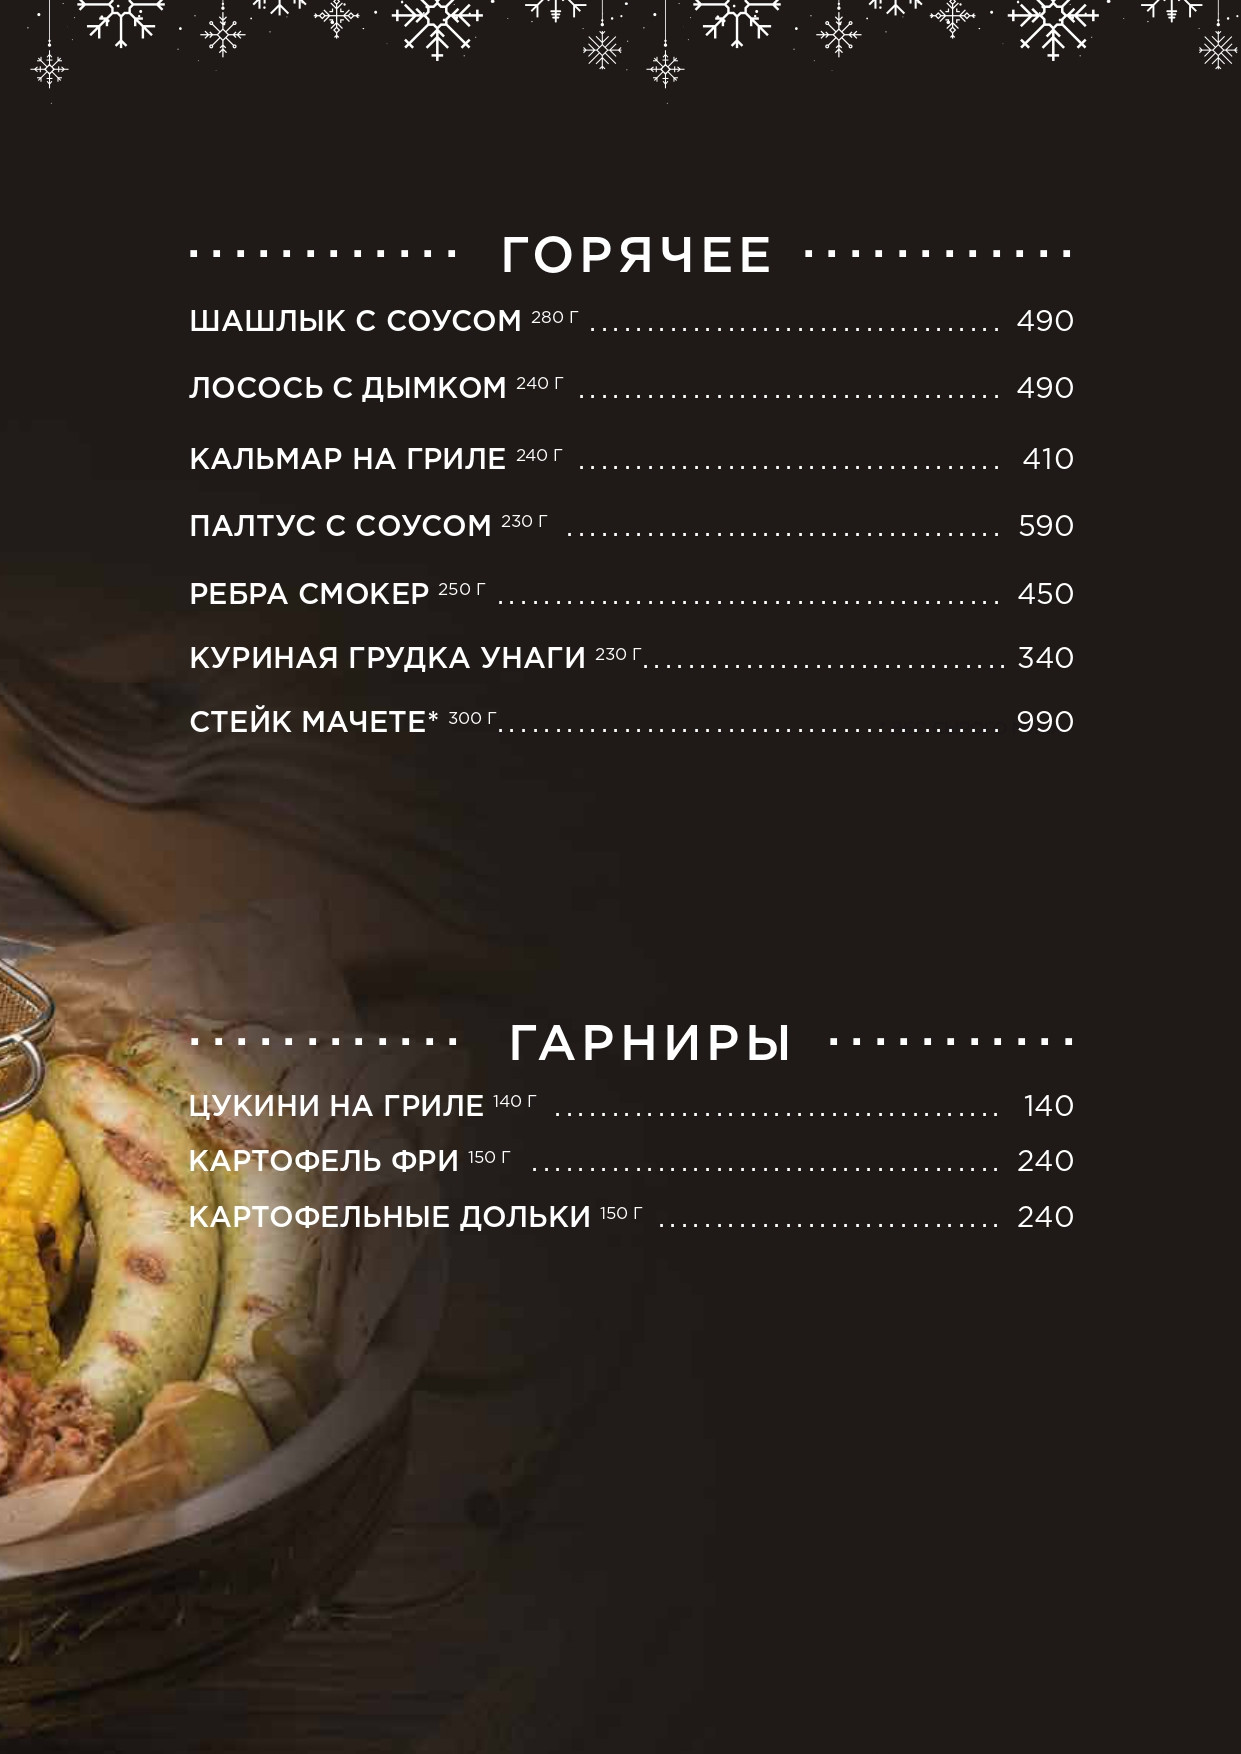 gastroli_menu_ny_2021_1превью_page-0005.